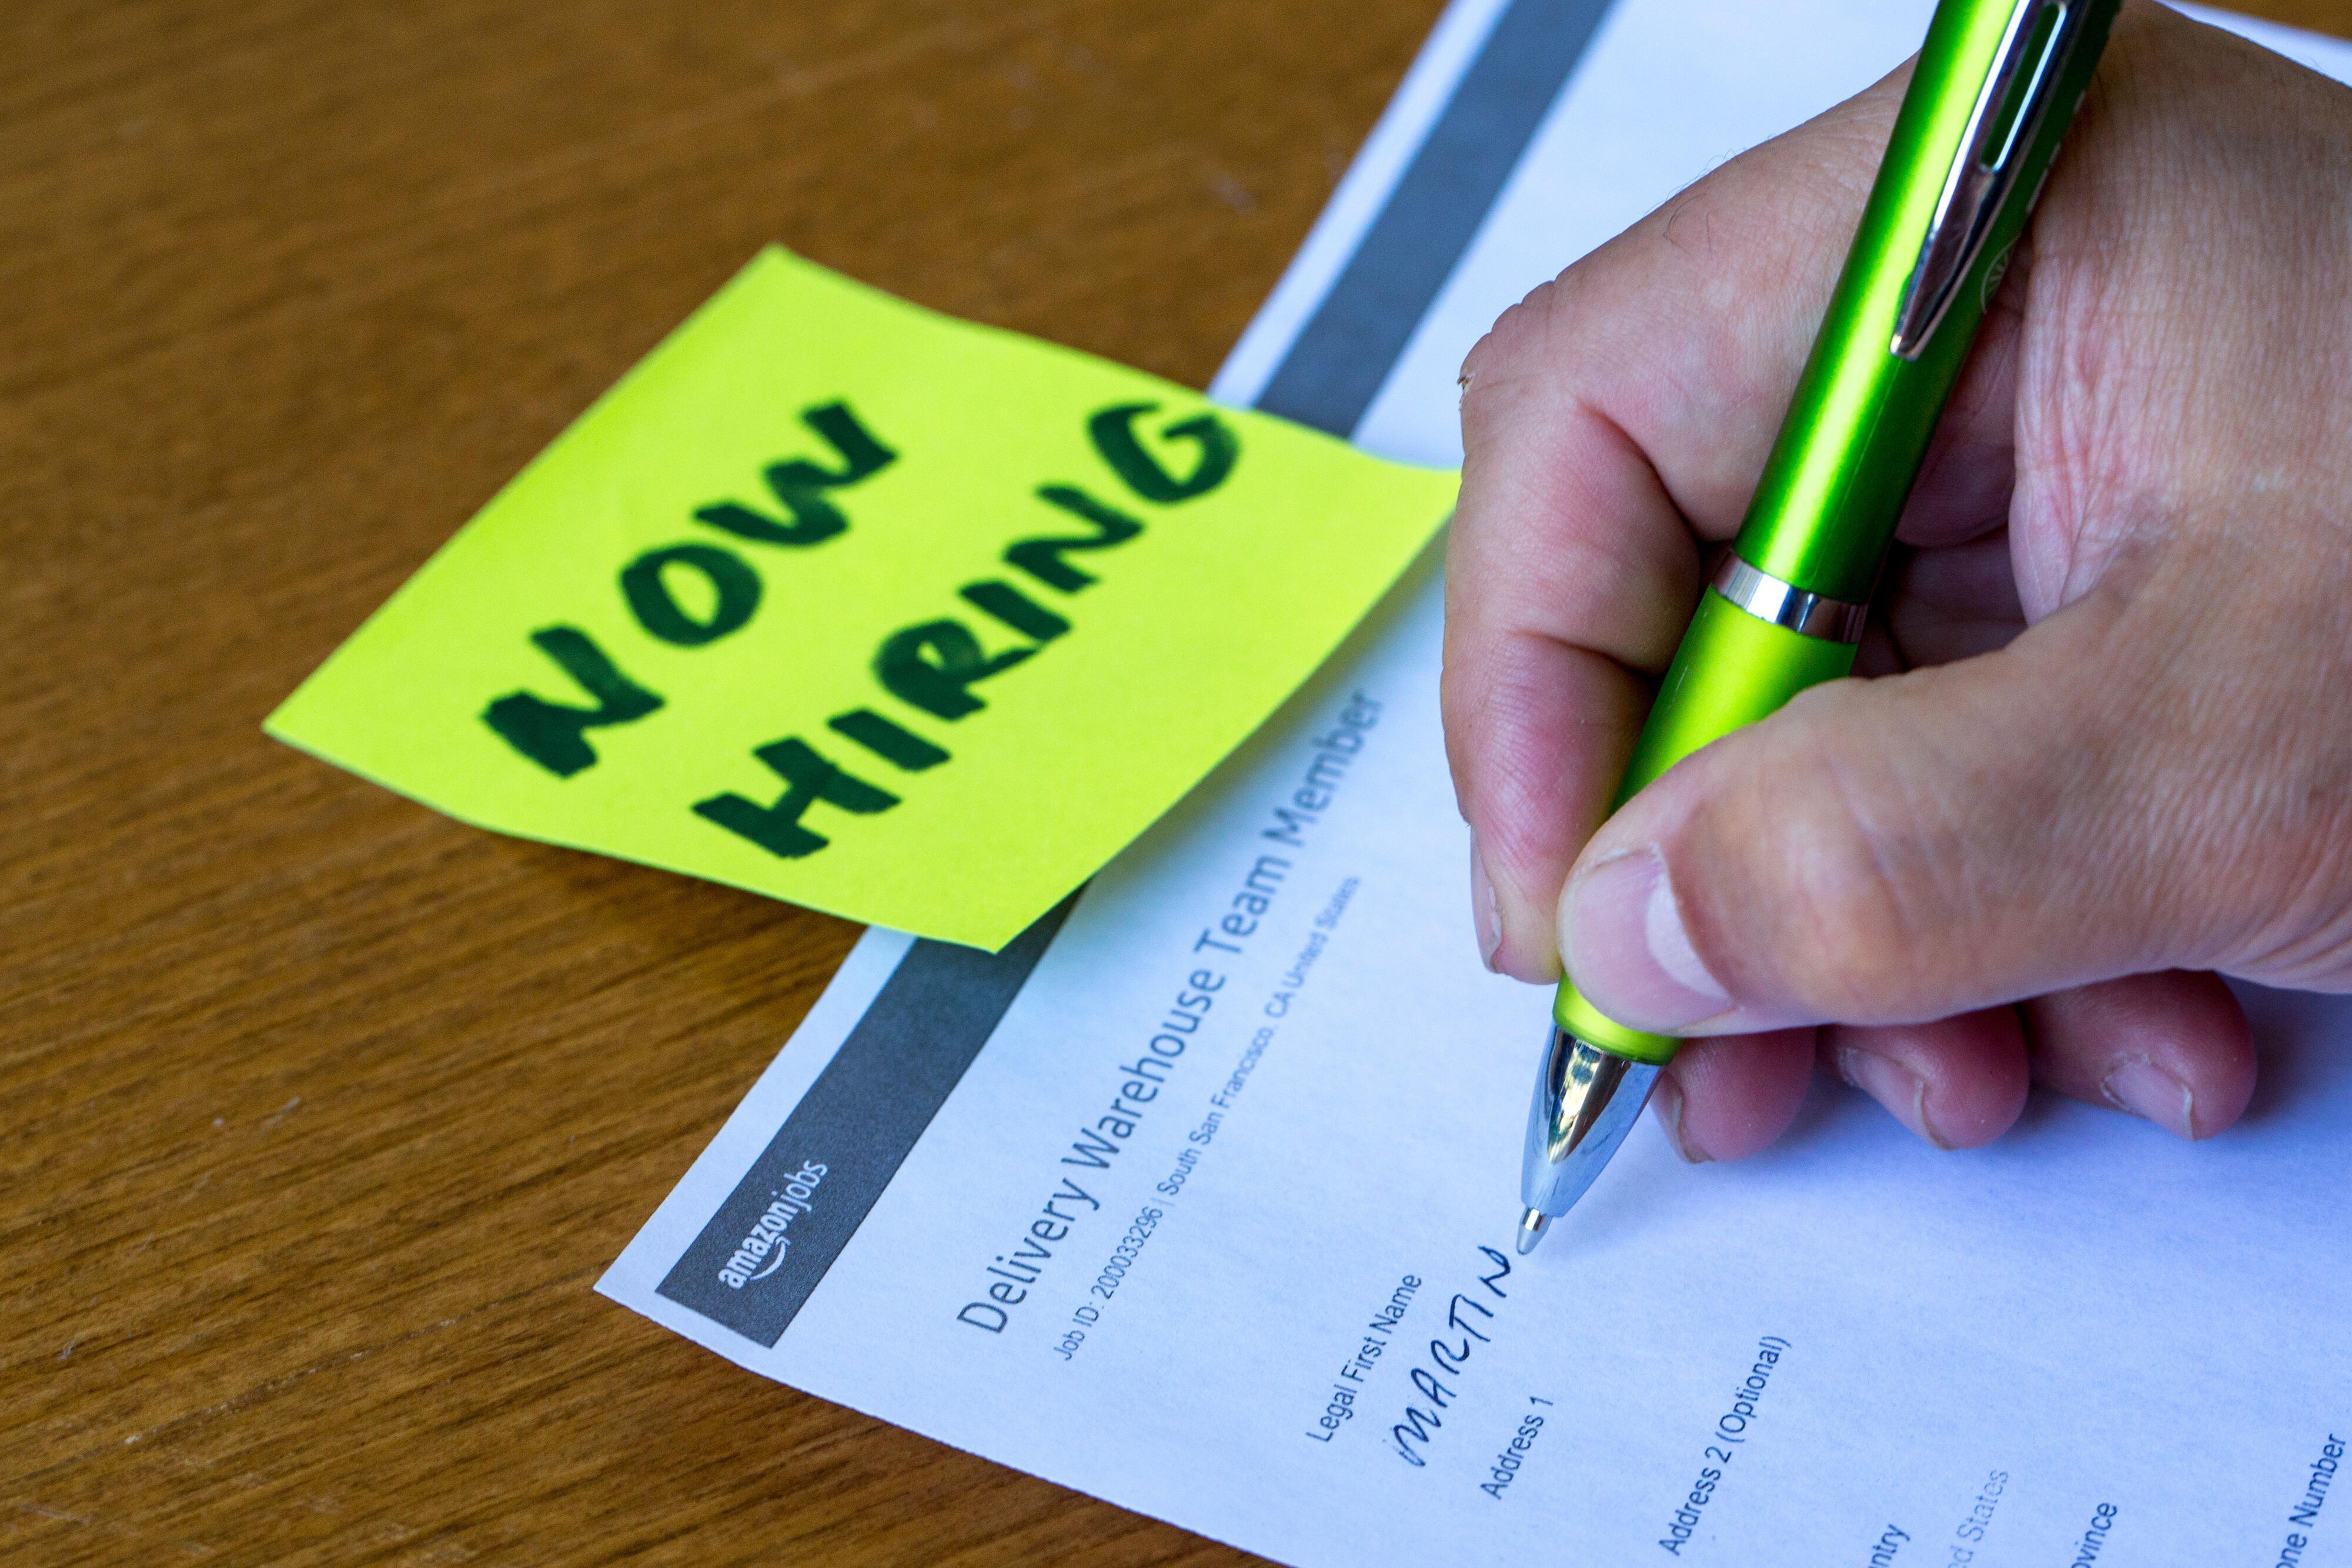 amazon-job-application-now-hiring-1836